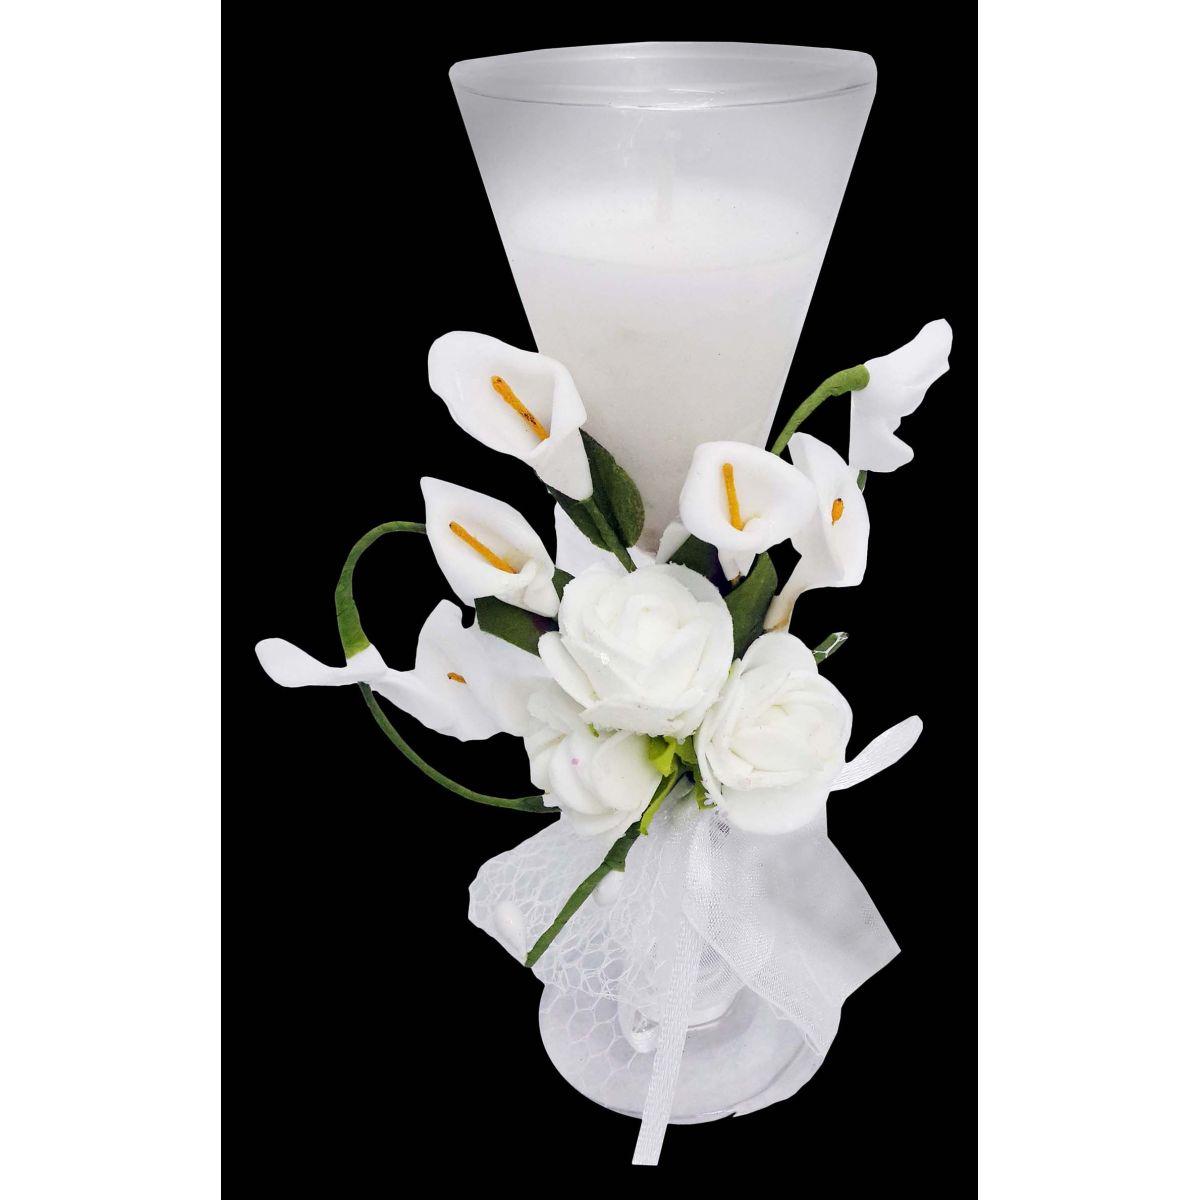 Vela de Parafina Enfeite Pequena Eventos Flor Branca (WL-C)